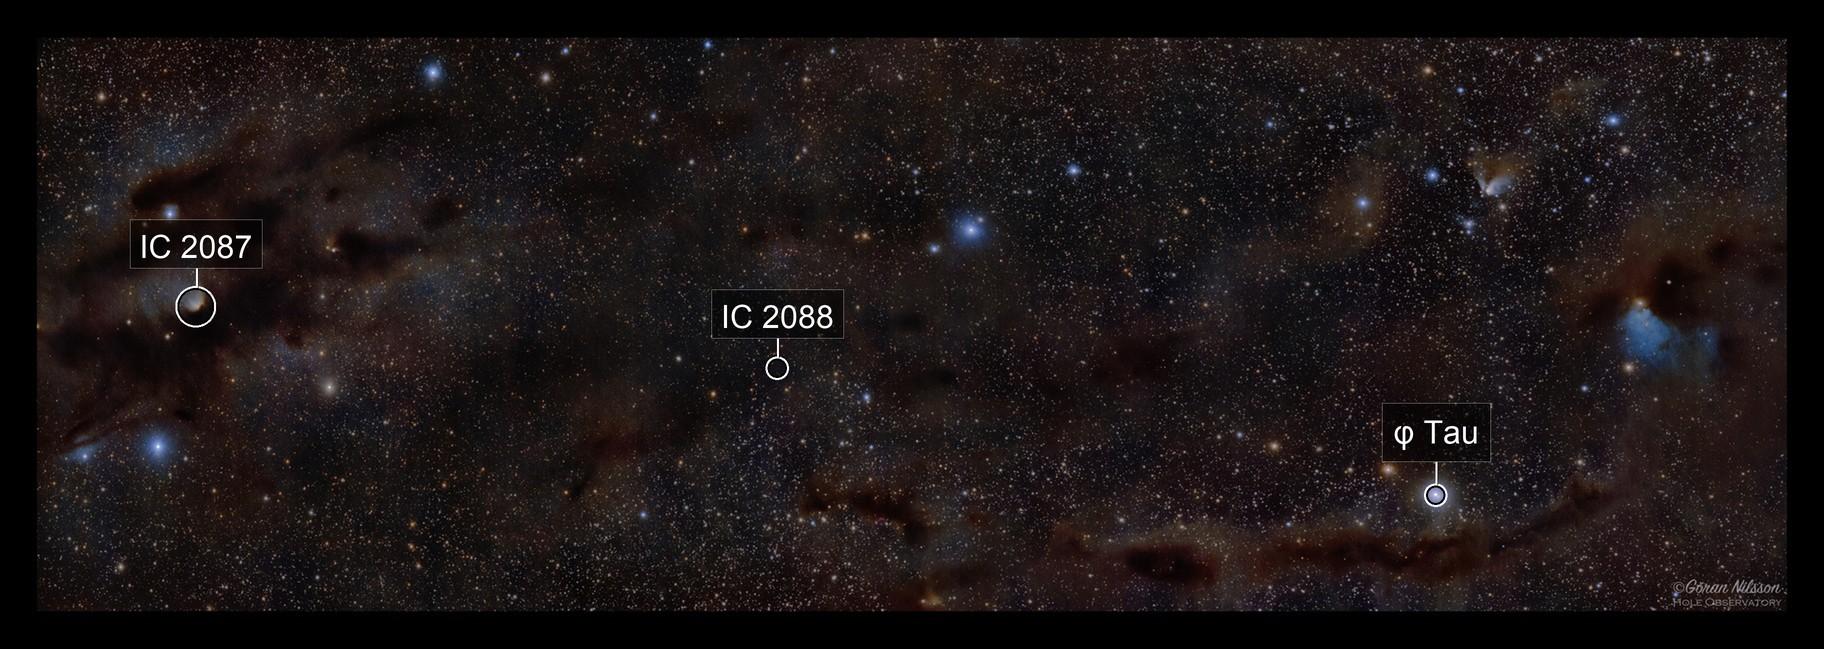 From Barnard 10 to Barnard 14 in Taurus